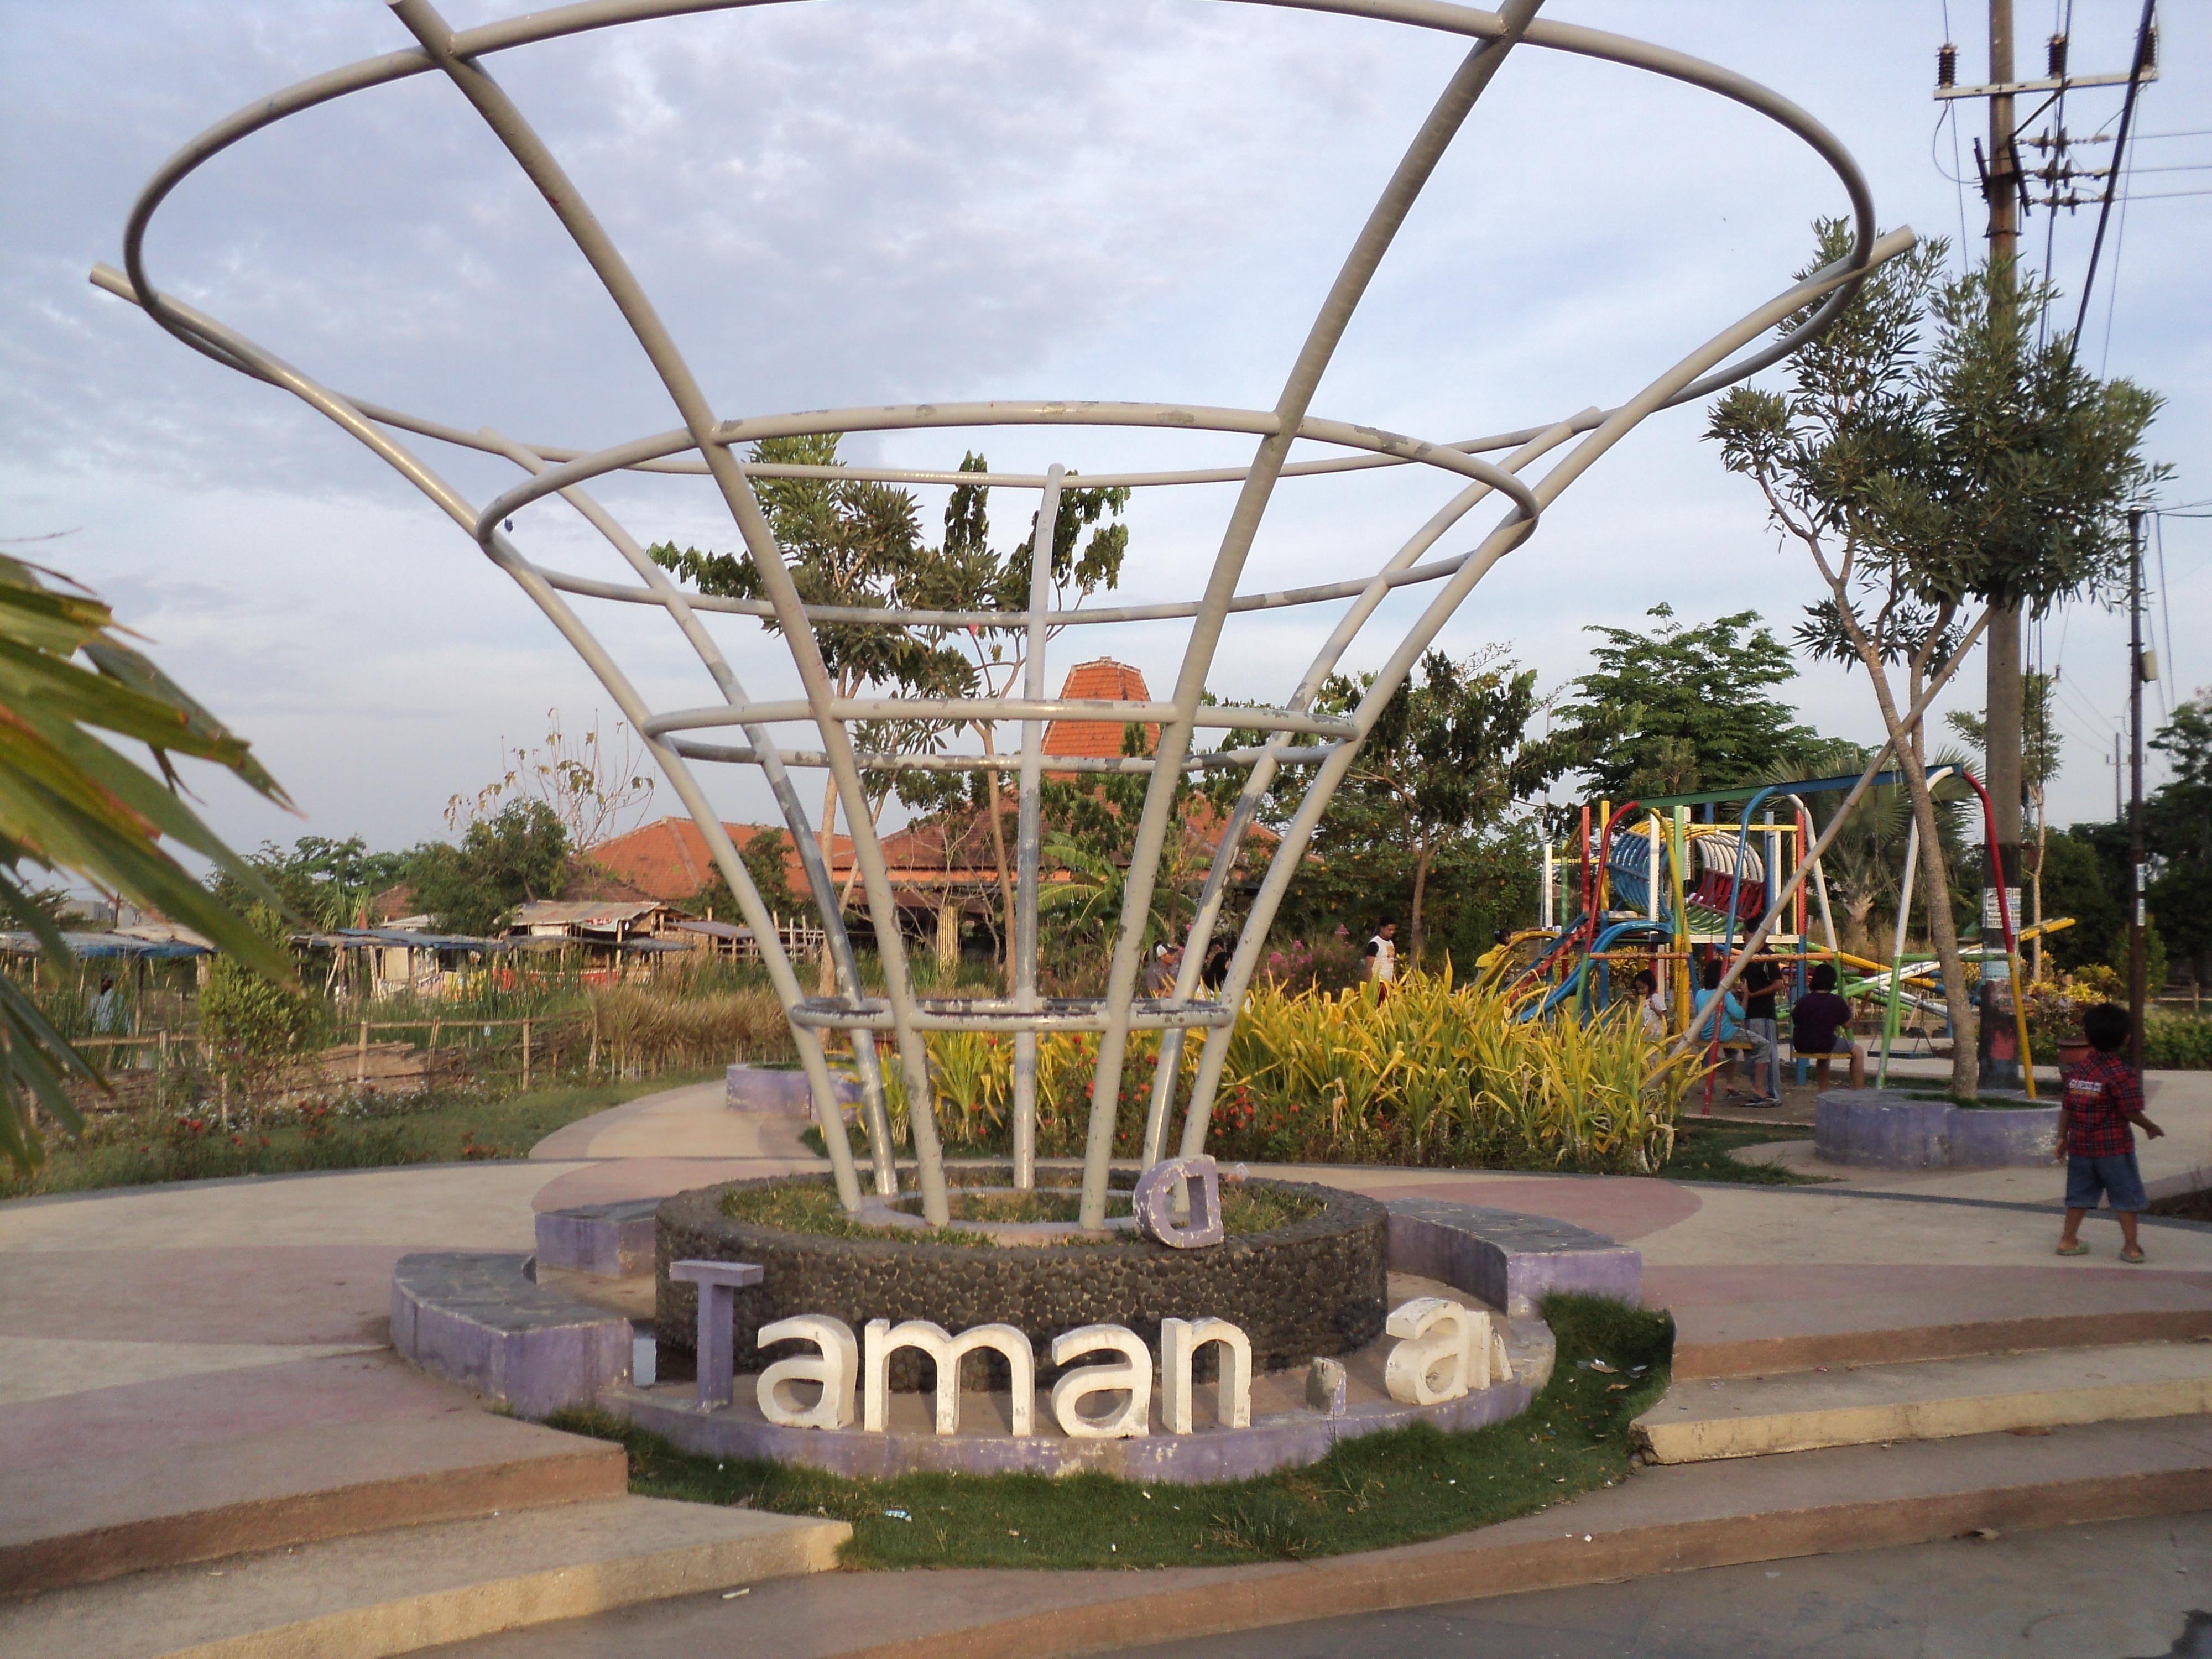 Taman Surabaya Barat Pesona Kota Gapura Pakal Dr Soetomo Persahabatan